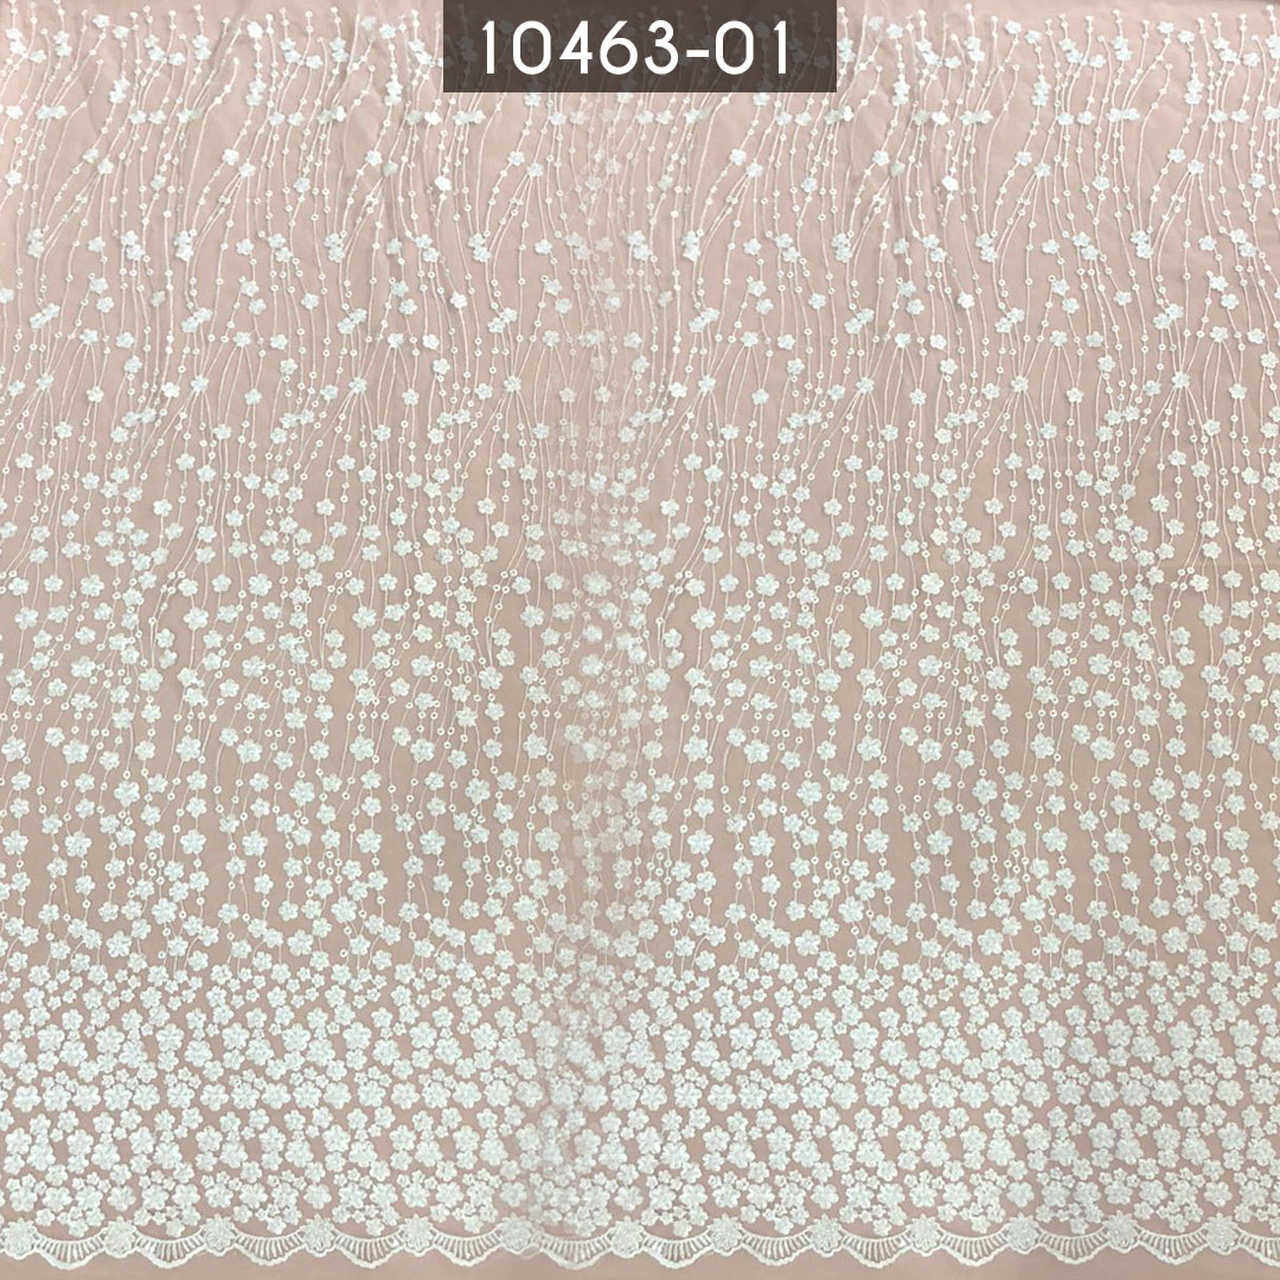 Tecido Renda Tule Bordada Floral Em Pedraria Branco